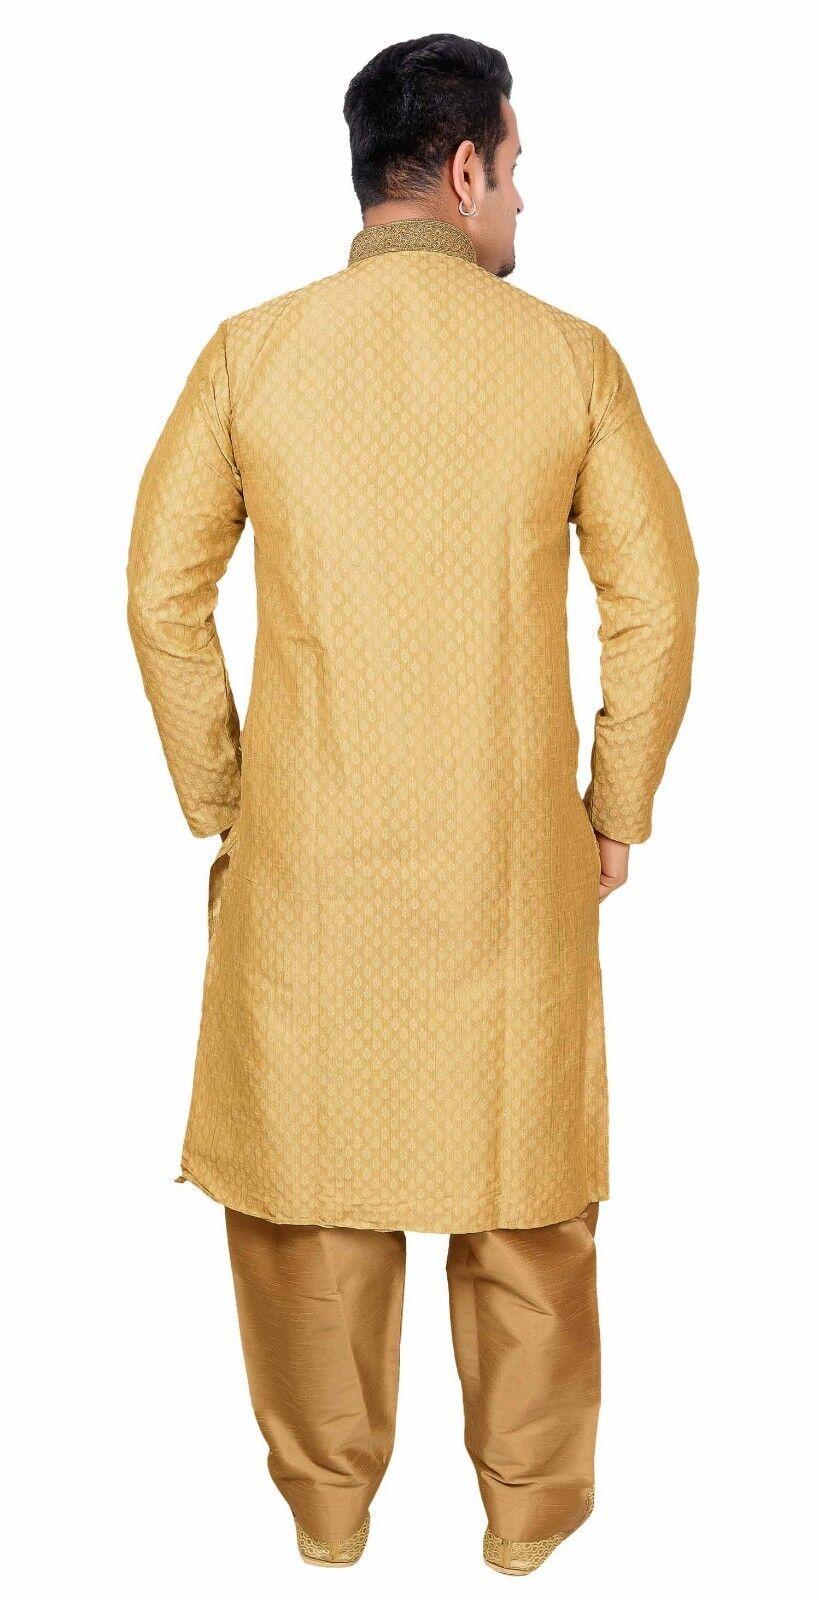 Mens Kurta Shalwar Shalwar Shalwar Kameez Pyjama Special Wedding Sherwani 2 Pcs Set Apparel 1836 | Erste Gruppe von Kunden  027e7b